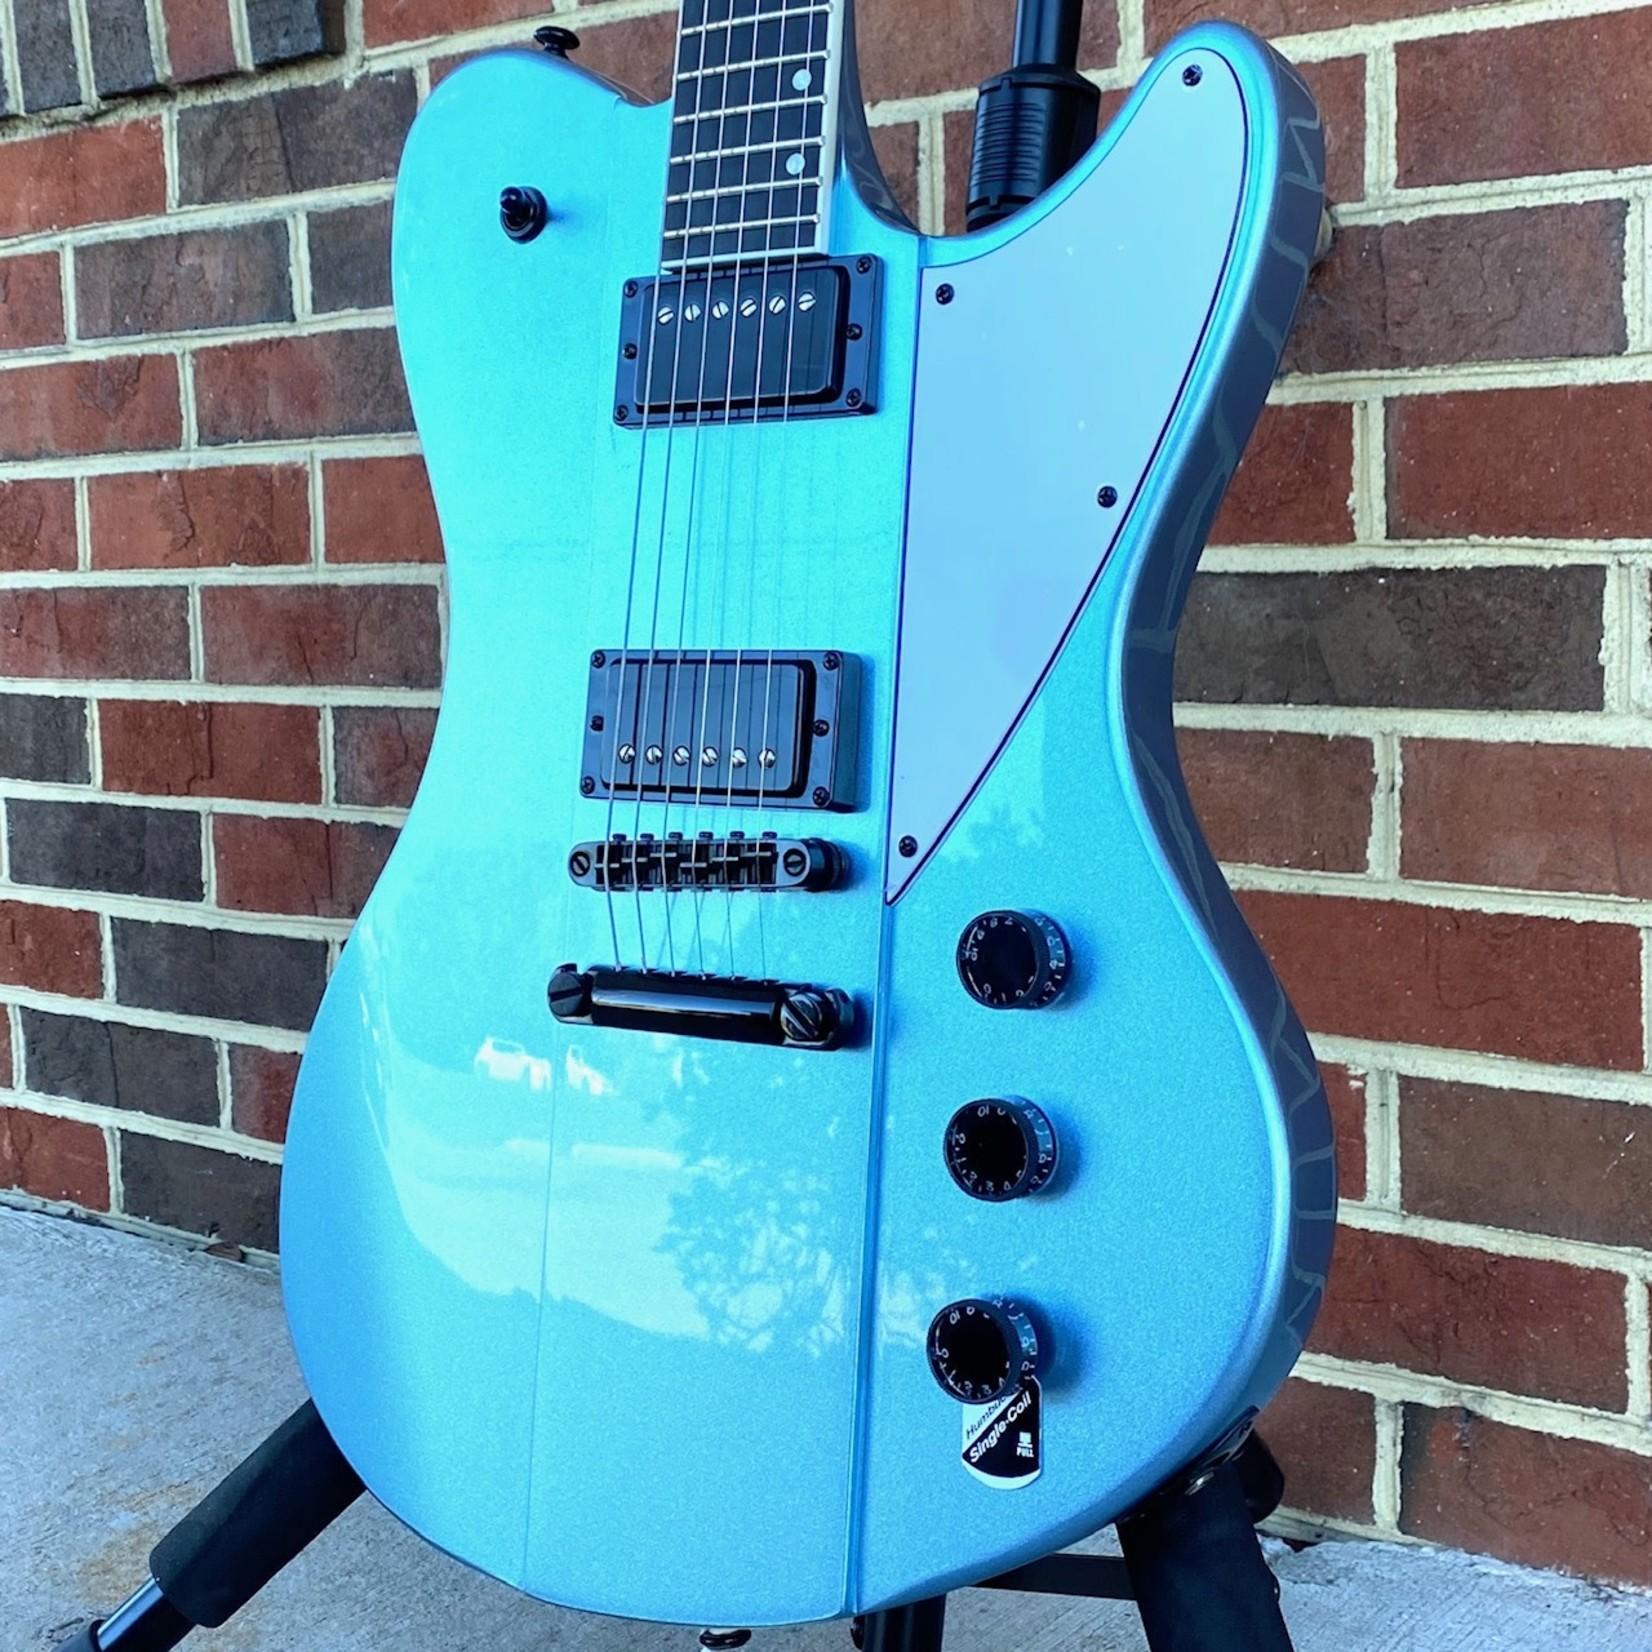 Schecter Guitar Research Schecter Ultra, Pelham Blue, Ebony FB, Grover Tuners, Schecter USA Sunset Strip Bridge Pickup, Schecter USA Pasadena Neck Pickup